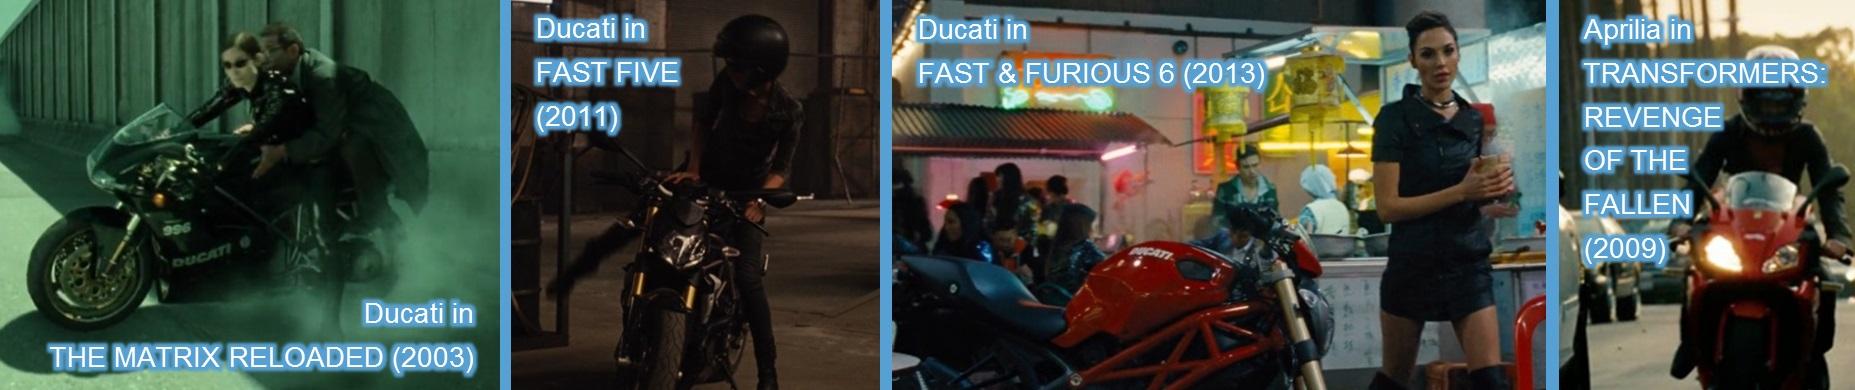 ducati aprilia entertainment movies